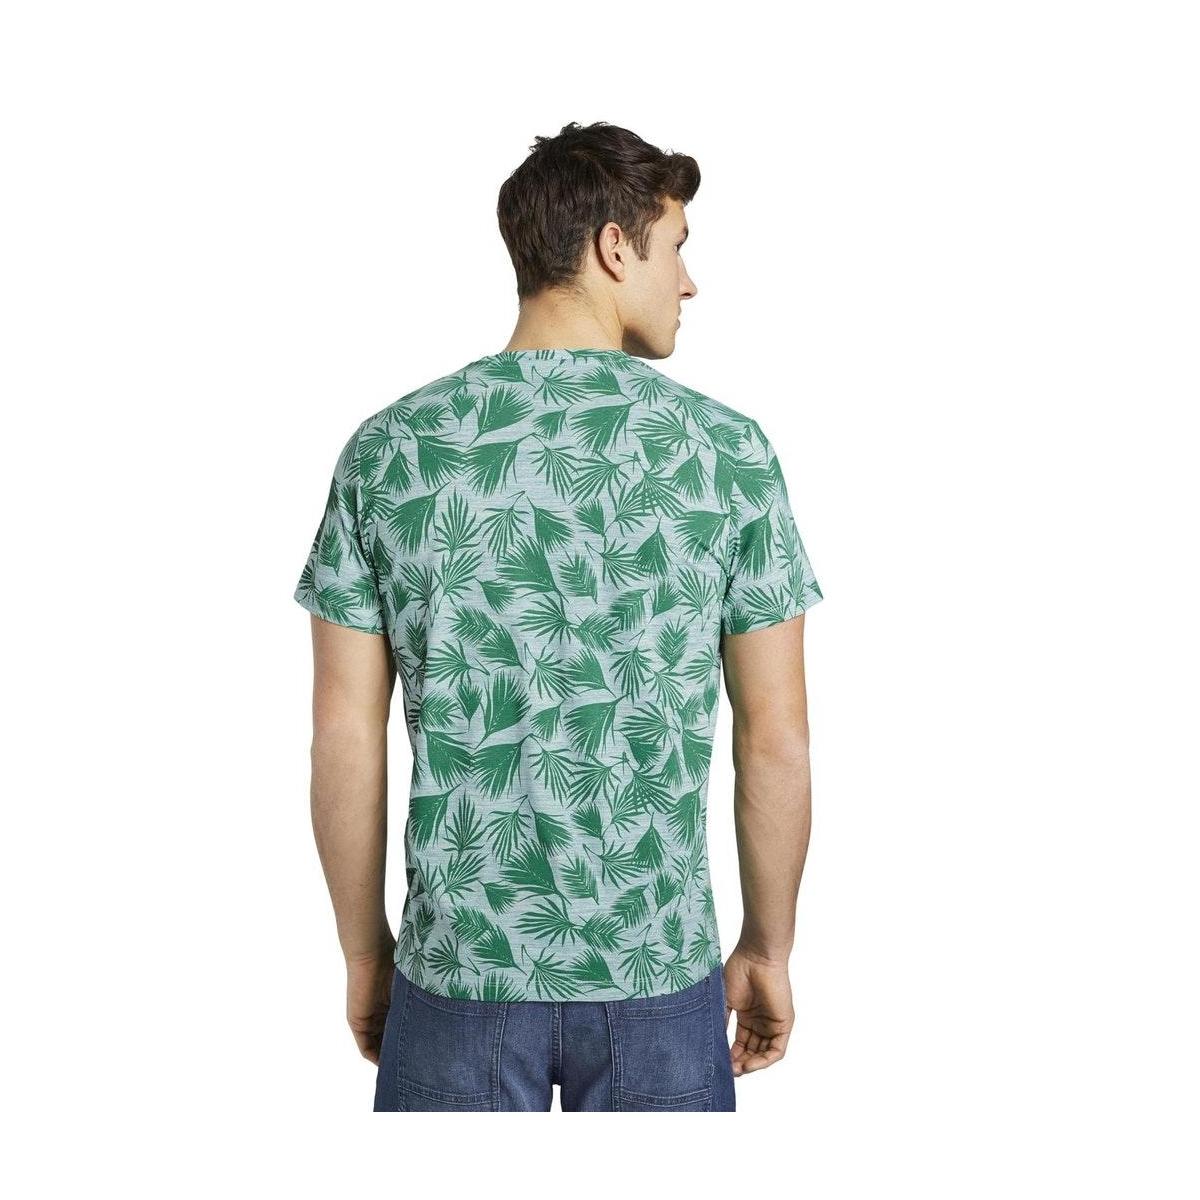 t shirt met all over print 1016148xx10 tom tailor t-shirt 22831